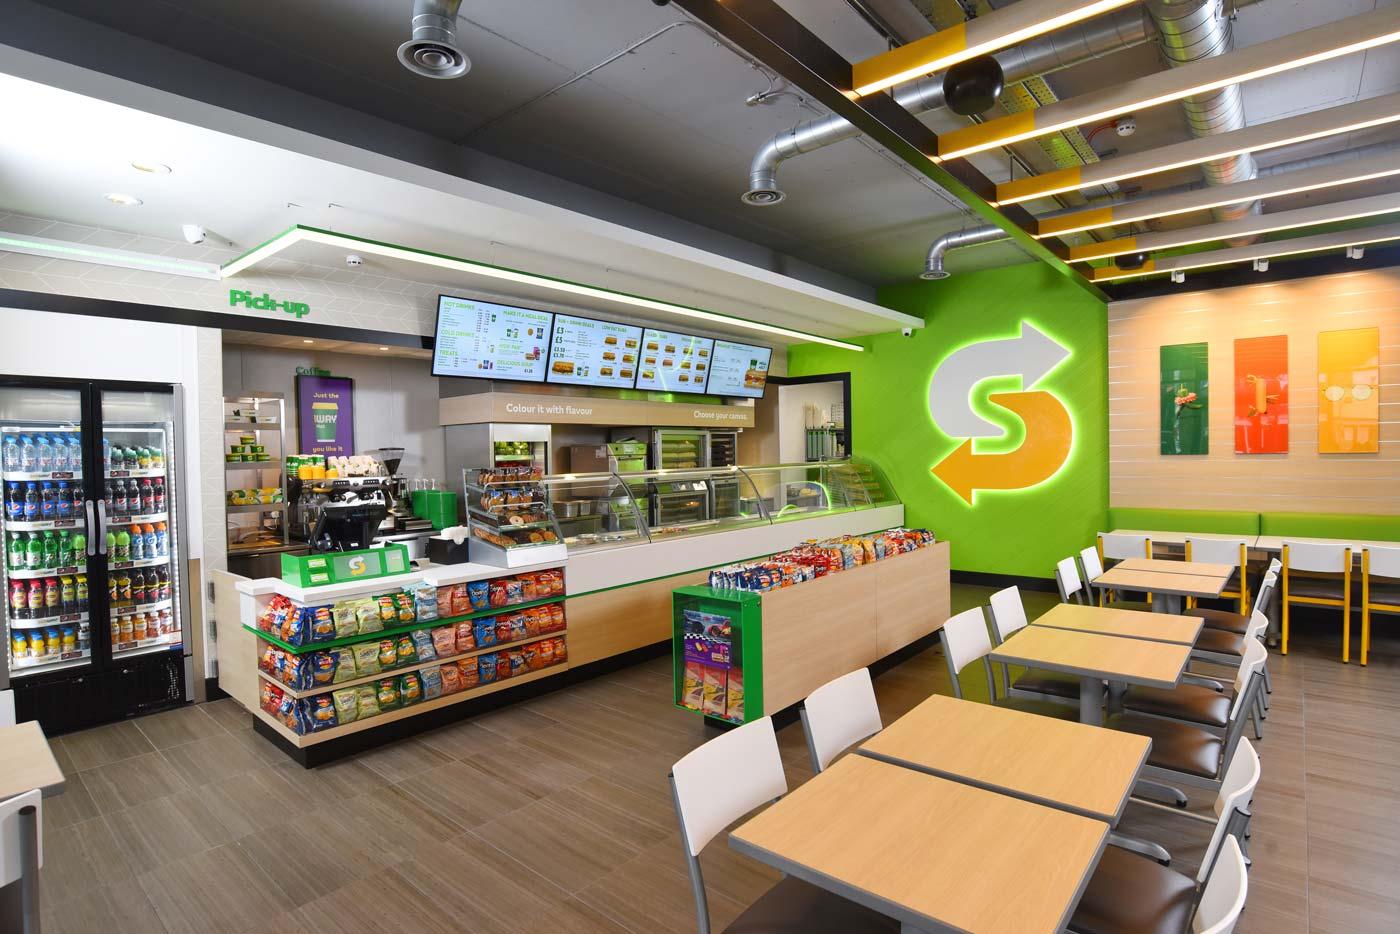 Subway restaurant with digital signage